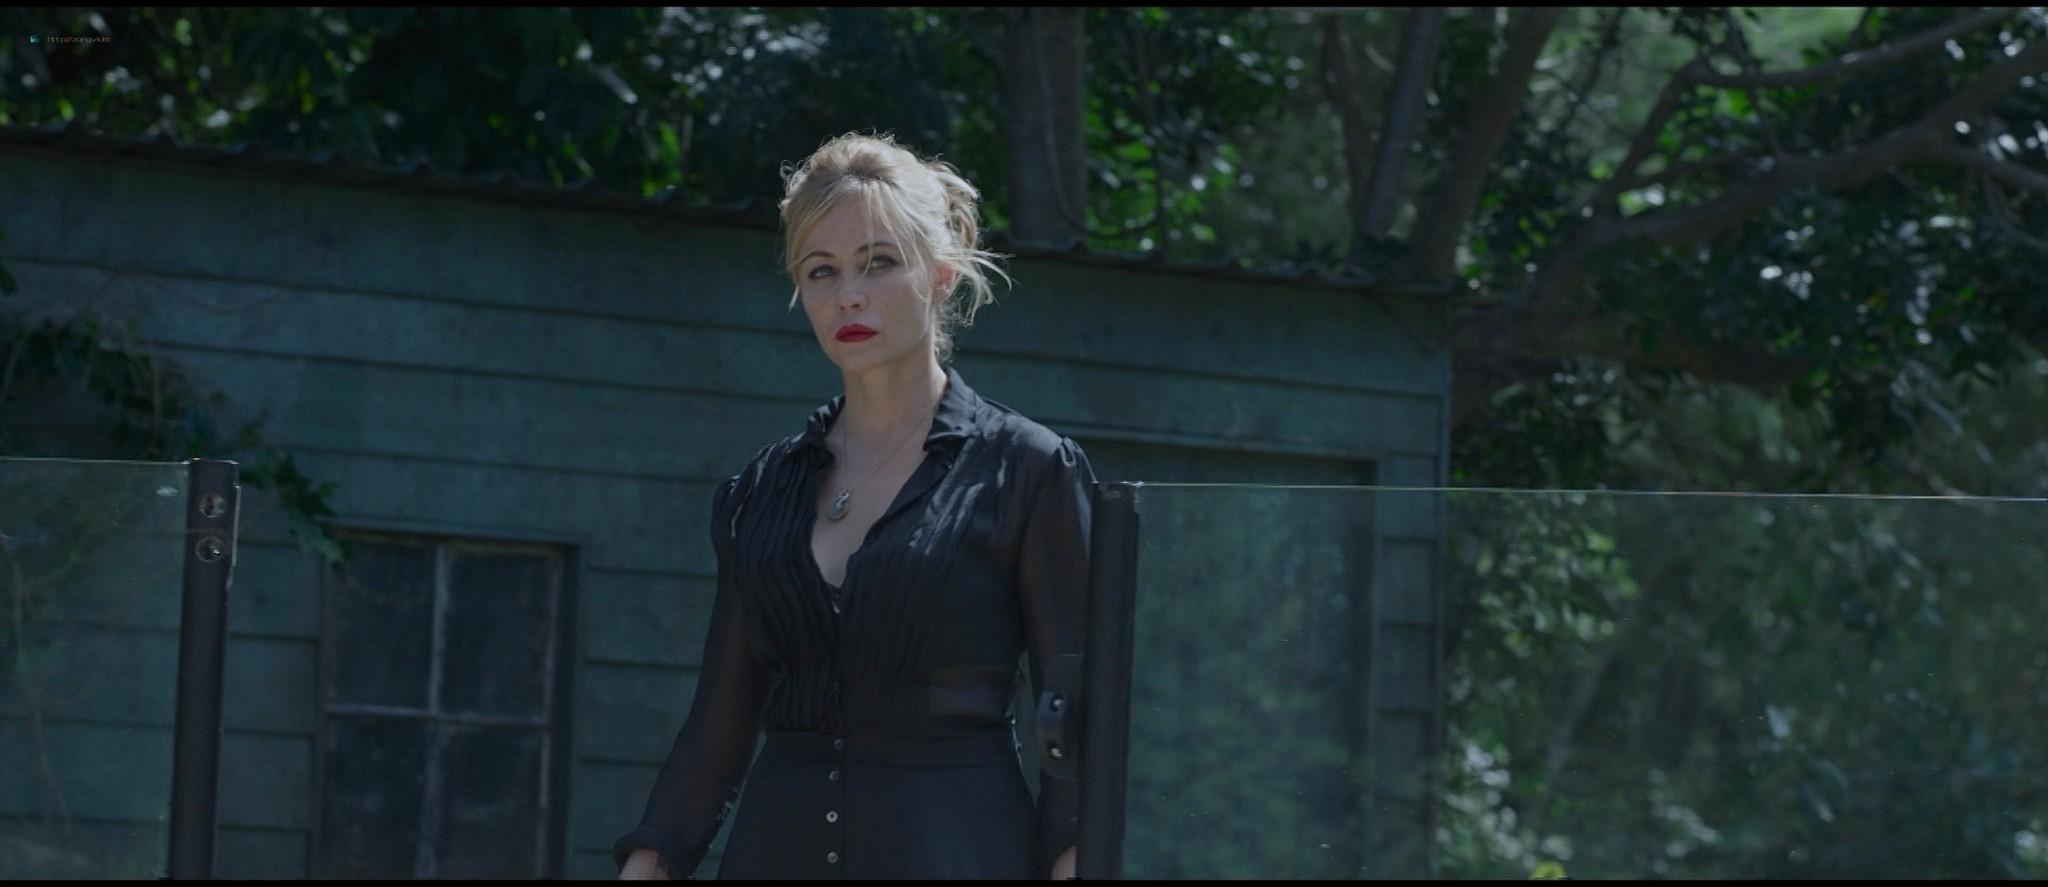 Emmanuelle Béart nude brief topless - My Mistress (AU-2014) HD 1080p BluRay (14)